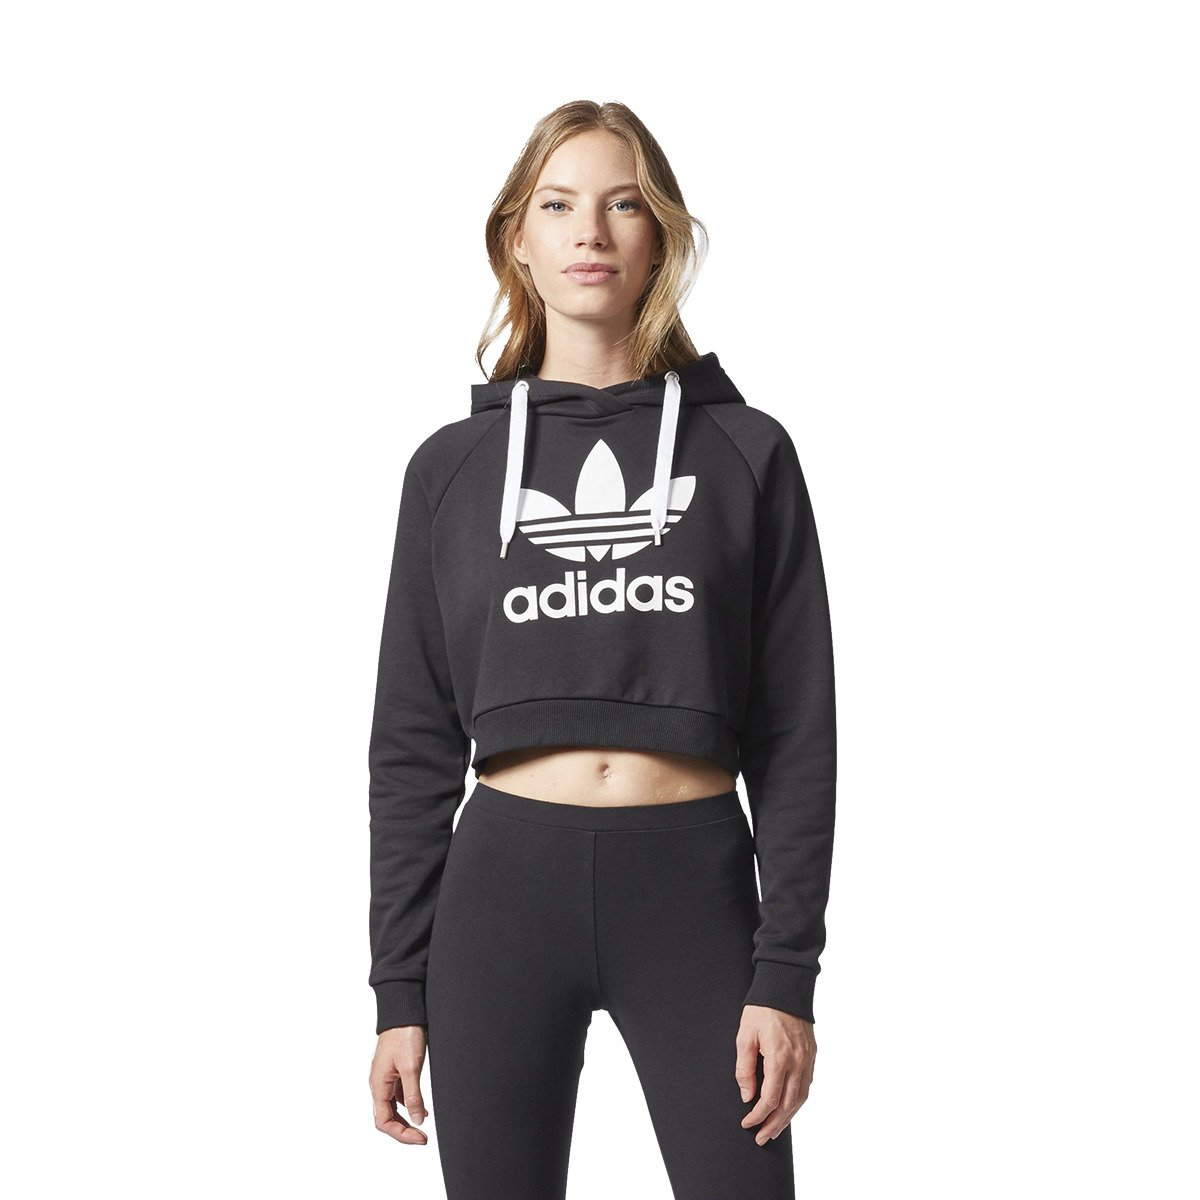 adidas sweat trefoil crop